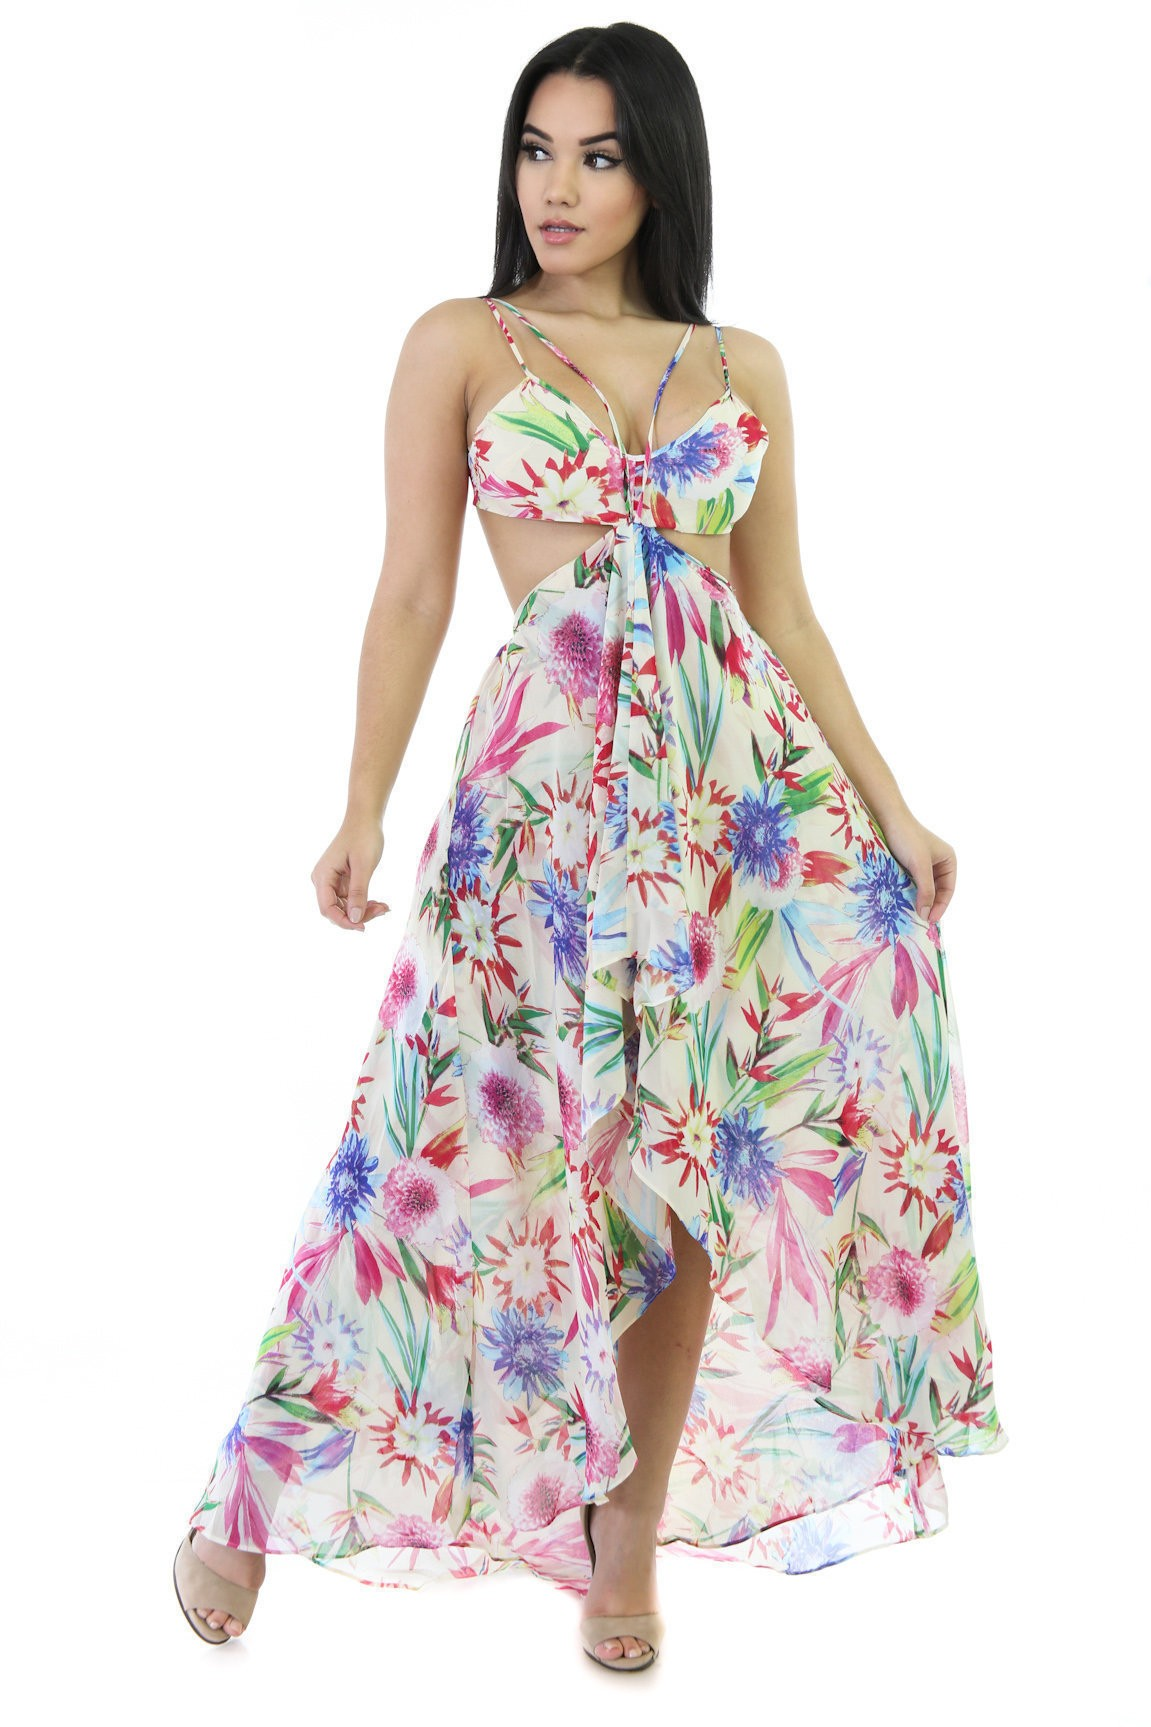 Floral Print Max Dress